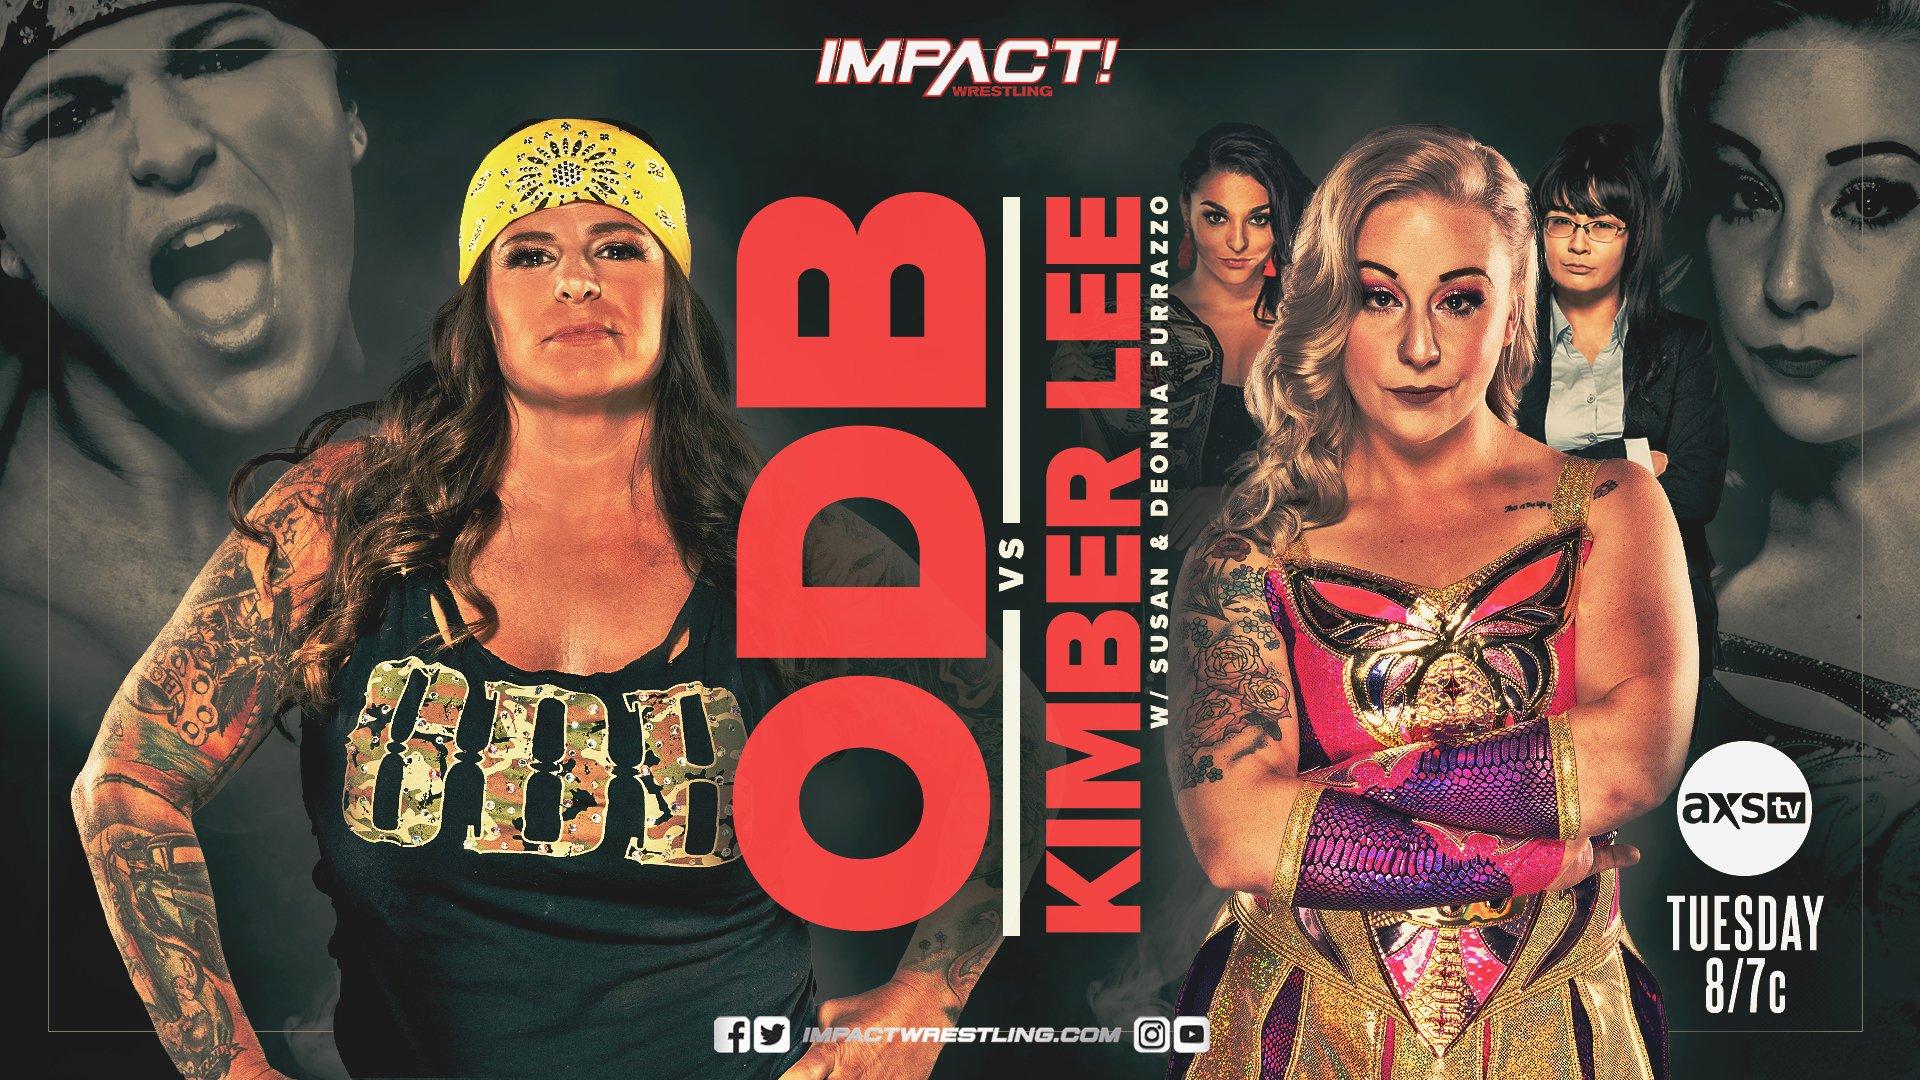 ODB Kimber Lee IMPACT Wrestling